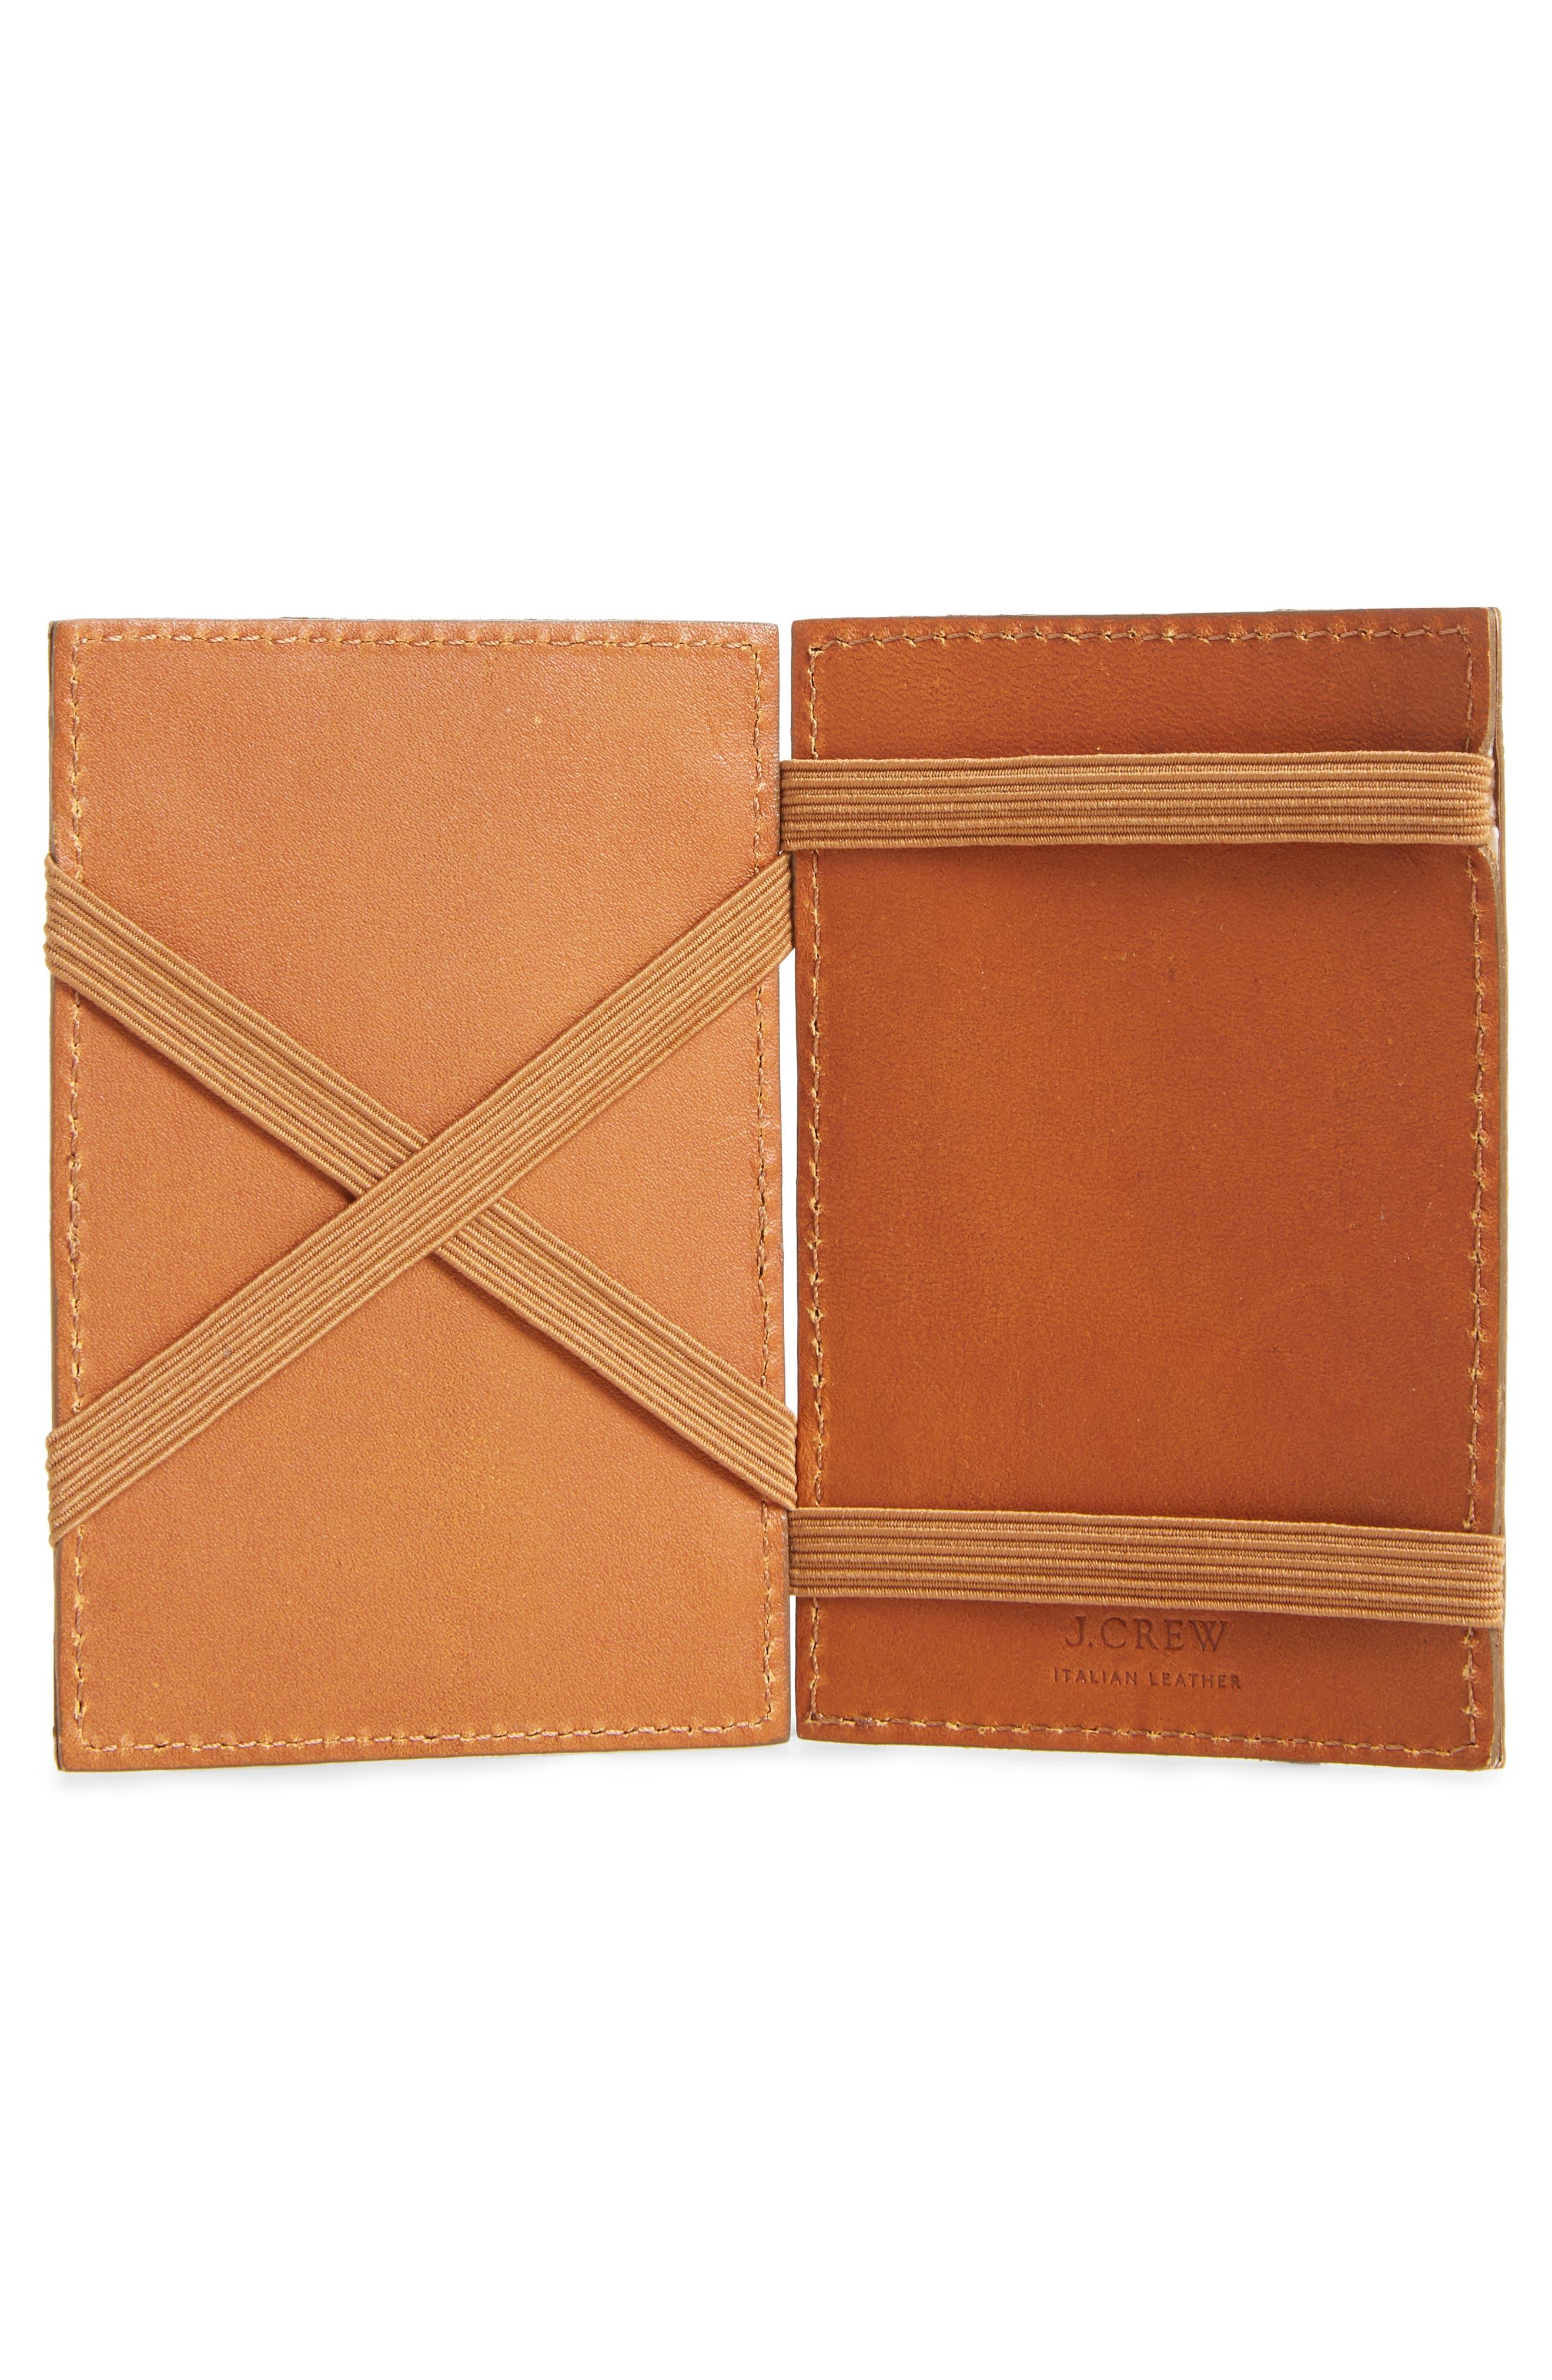 J.CREW,                             Magic Leather Wallet,                             Alternate thumbnail 2, color,                             200